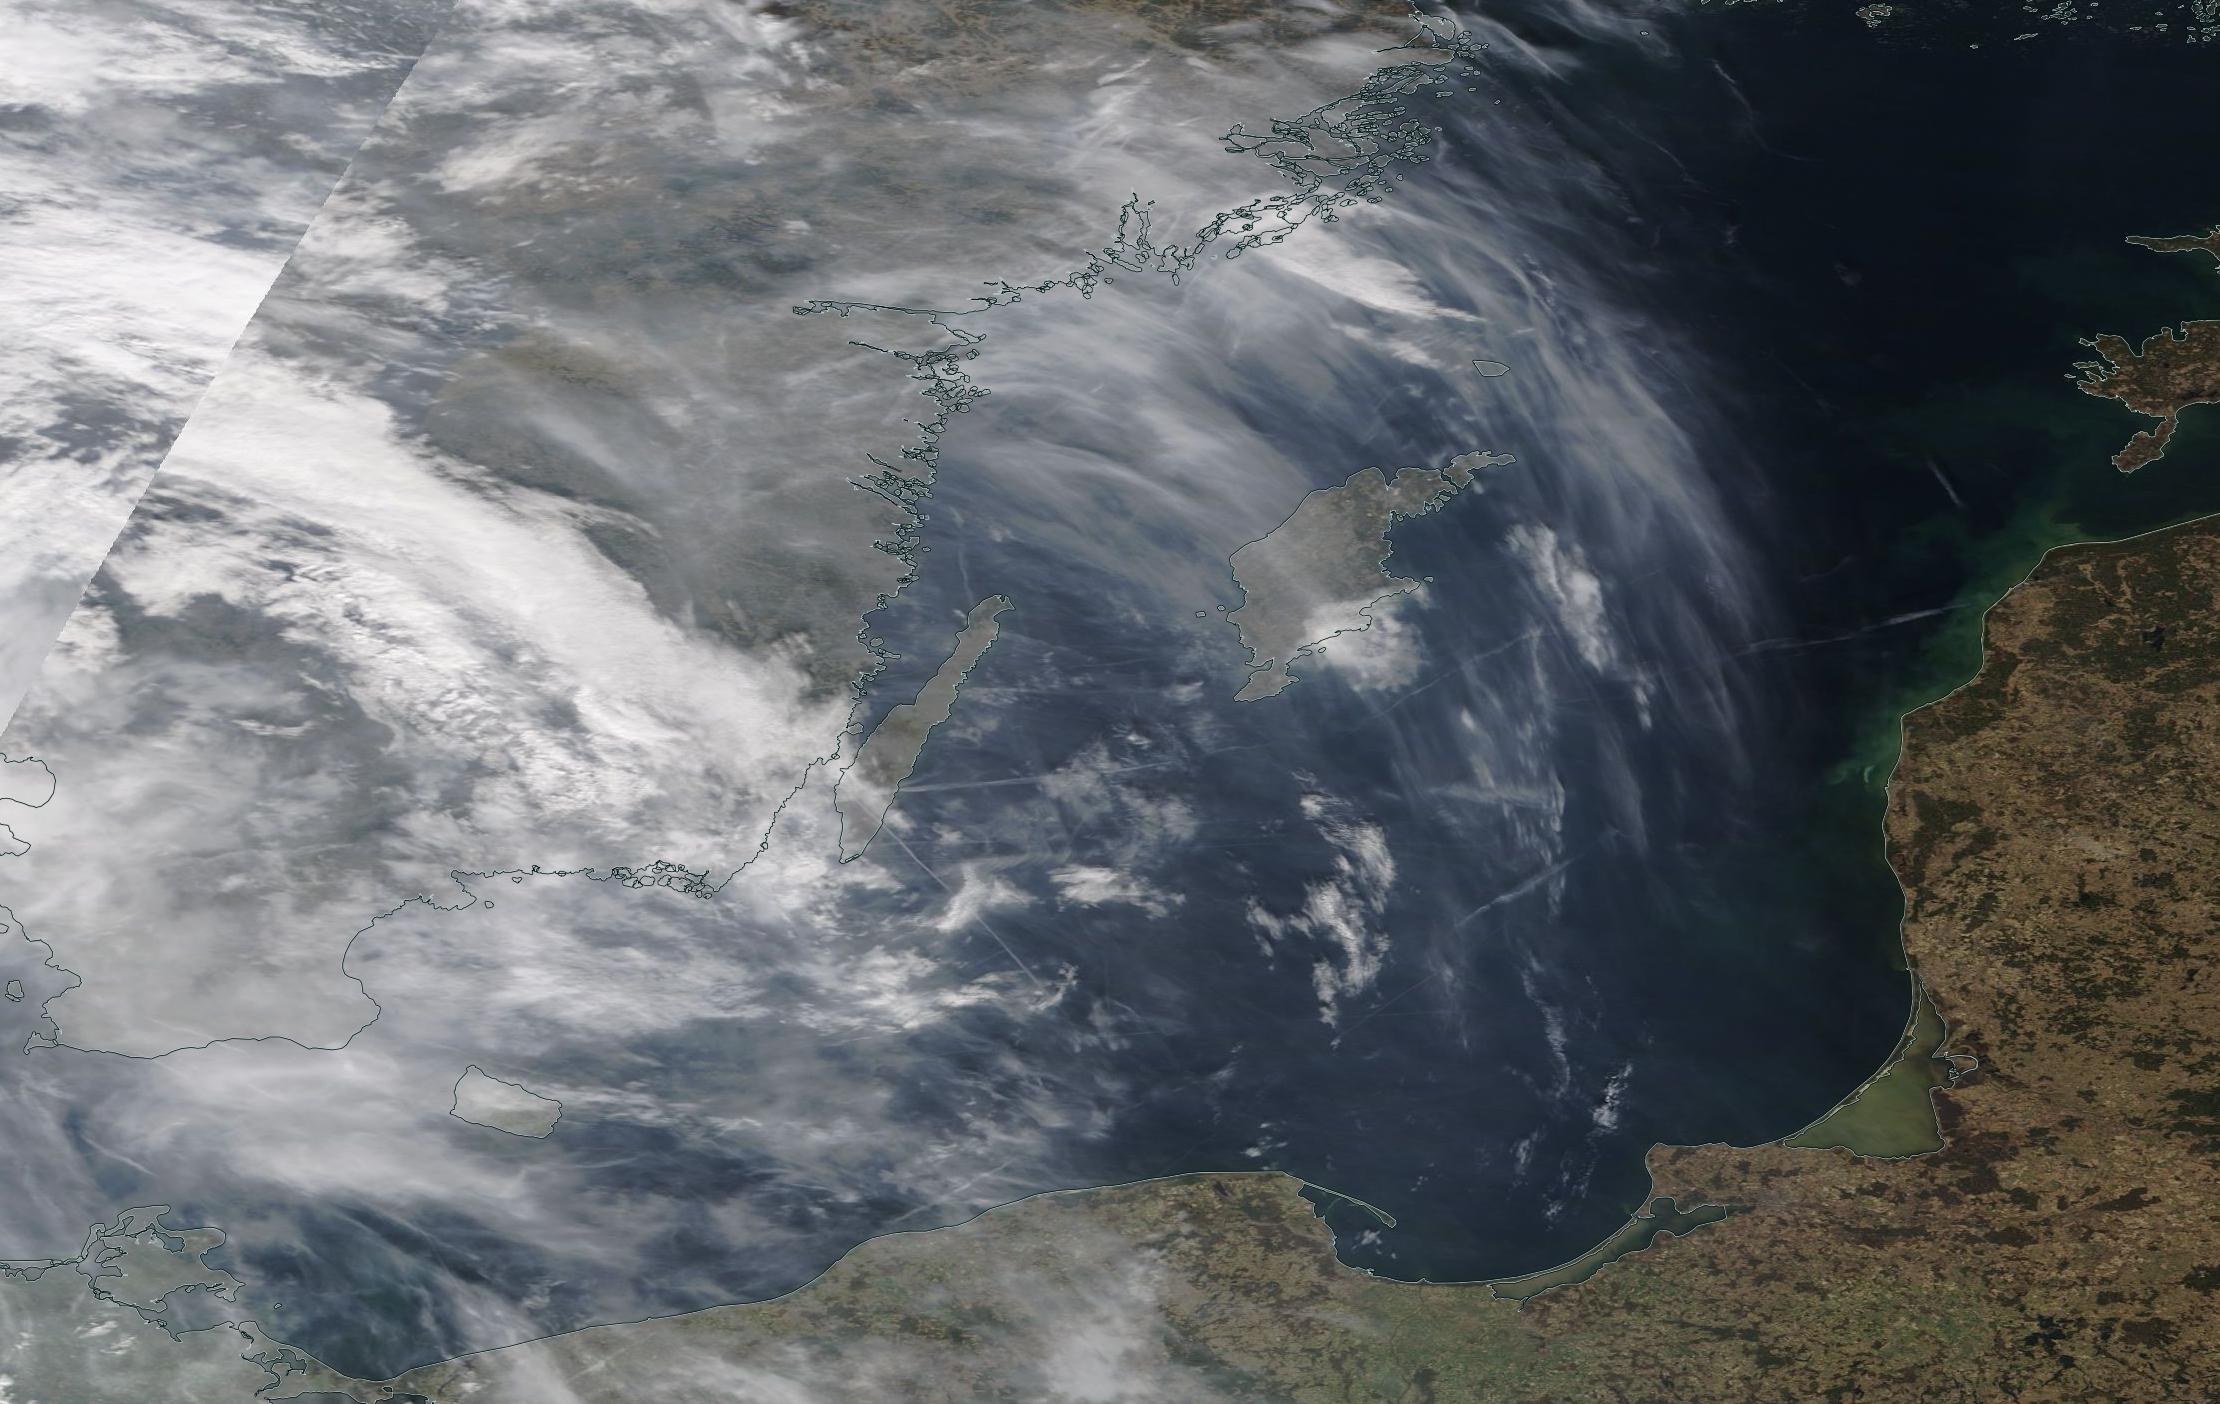 chemtrail geoengineering Kelmar Gotland Baltic Sea 3rd April 2019 ... https://go.nasa.gov/2FTxQSt